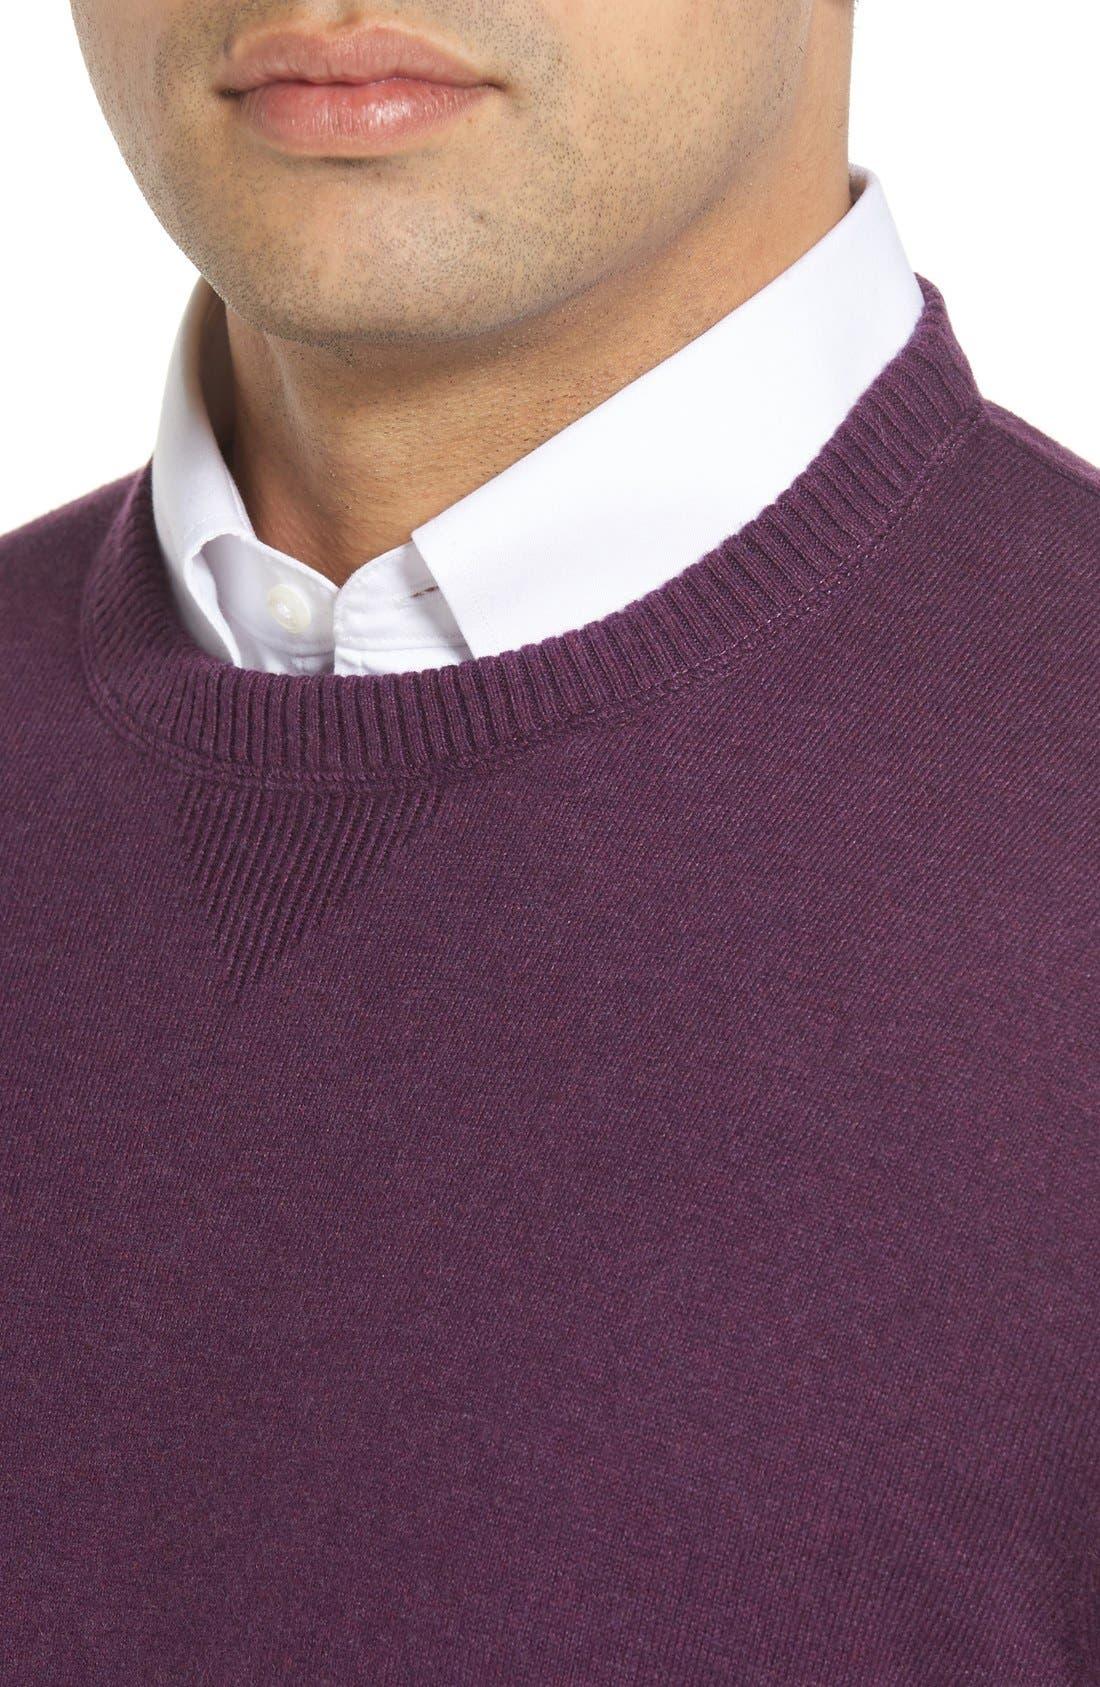 'Jersey Sport' Cotton Blend Crewneck Sweater,                             Alternate thumbnail 30, color,